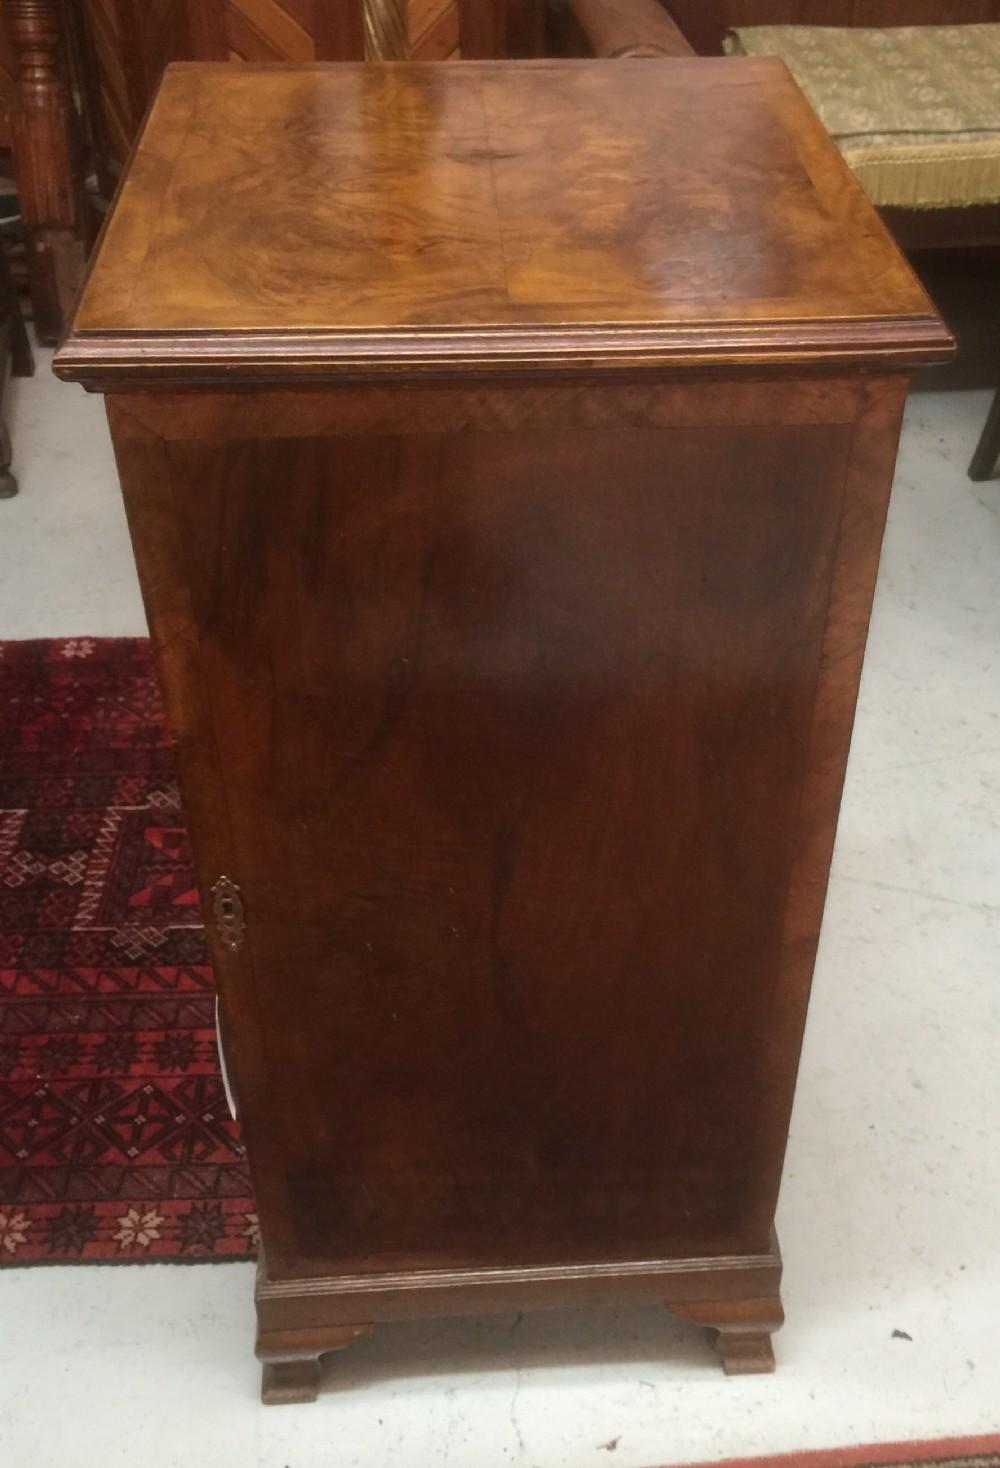 art deco burr walnut record cabinet - Art Deco Burr Walnut Record Cabinet 352780 Sellingantiques.co.uk